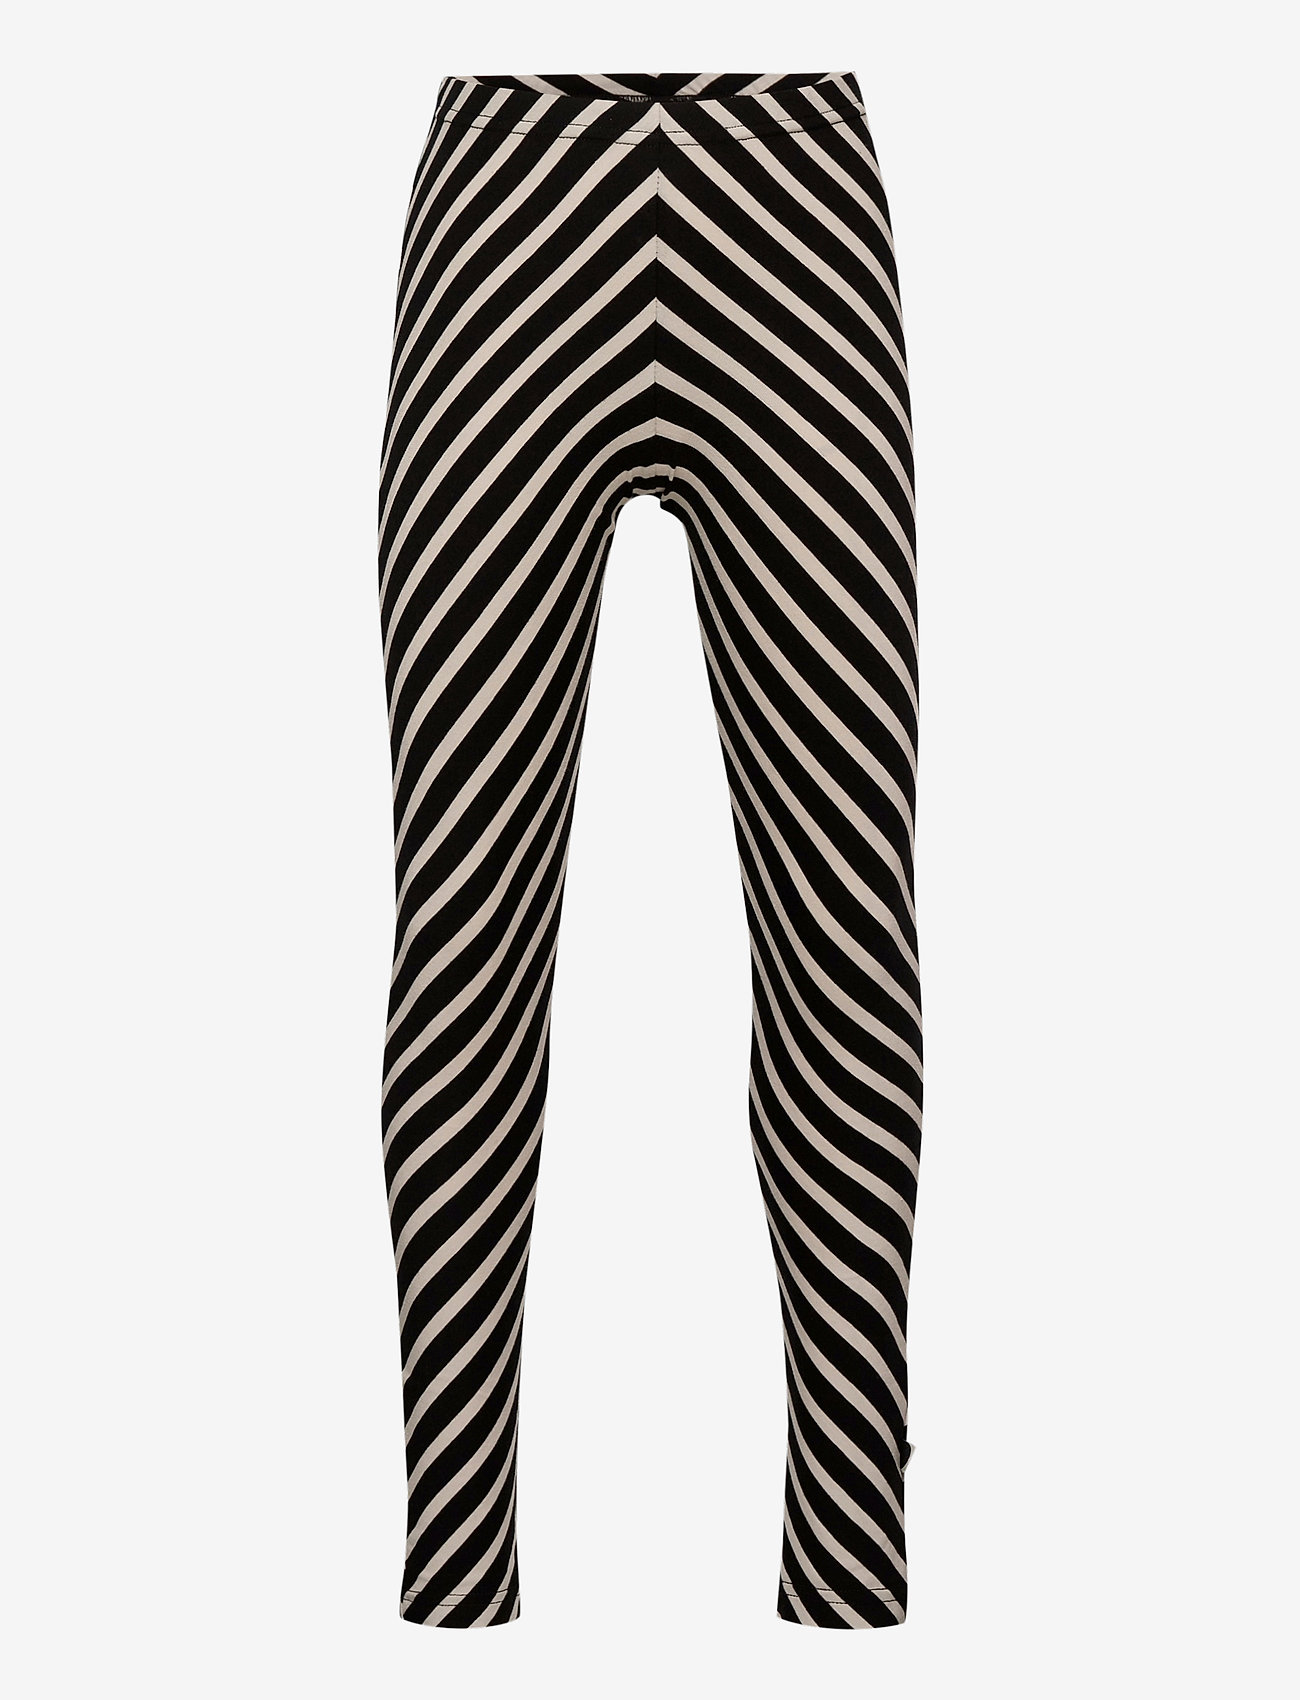 Papu - STRIPE LEGGINGS KID - leggings - black, sand - 0